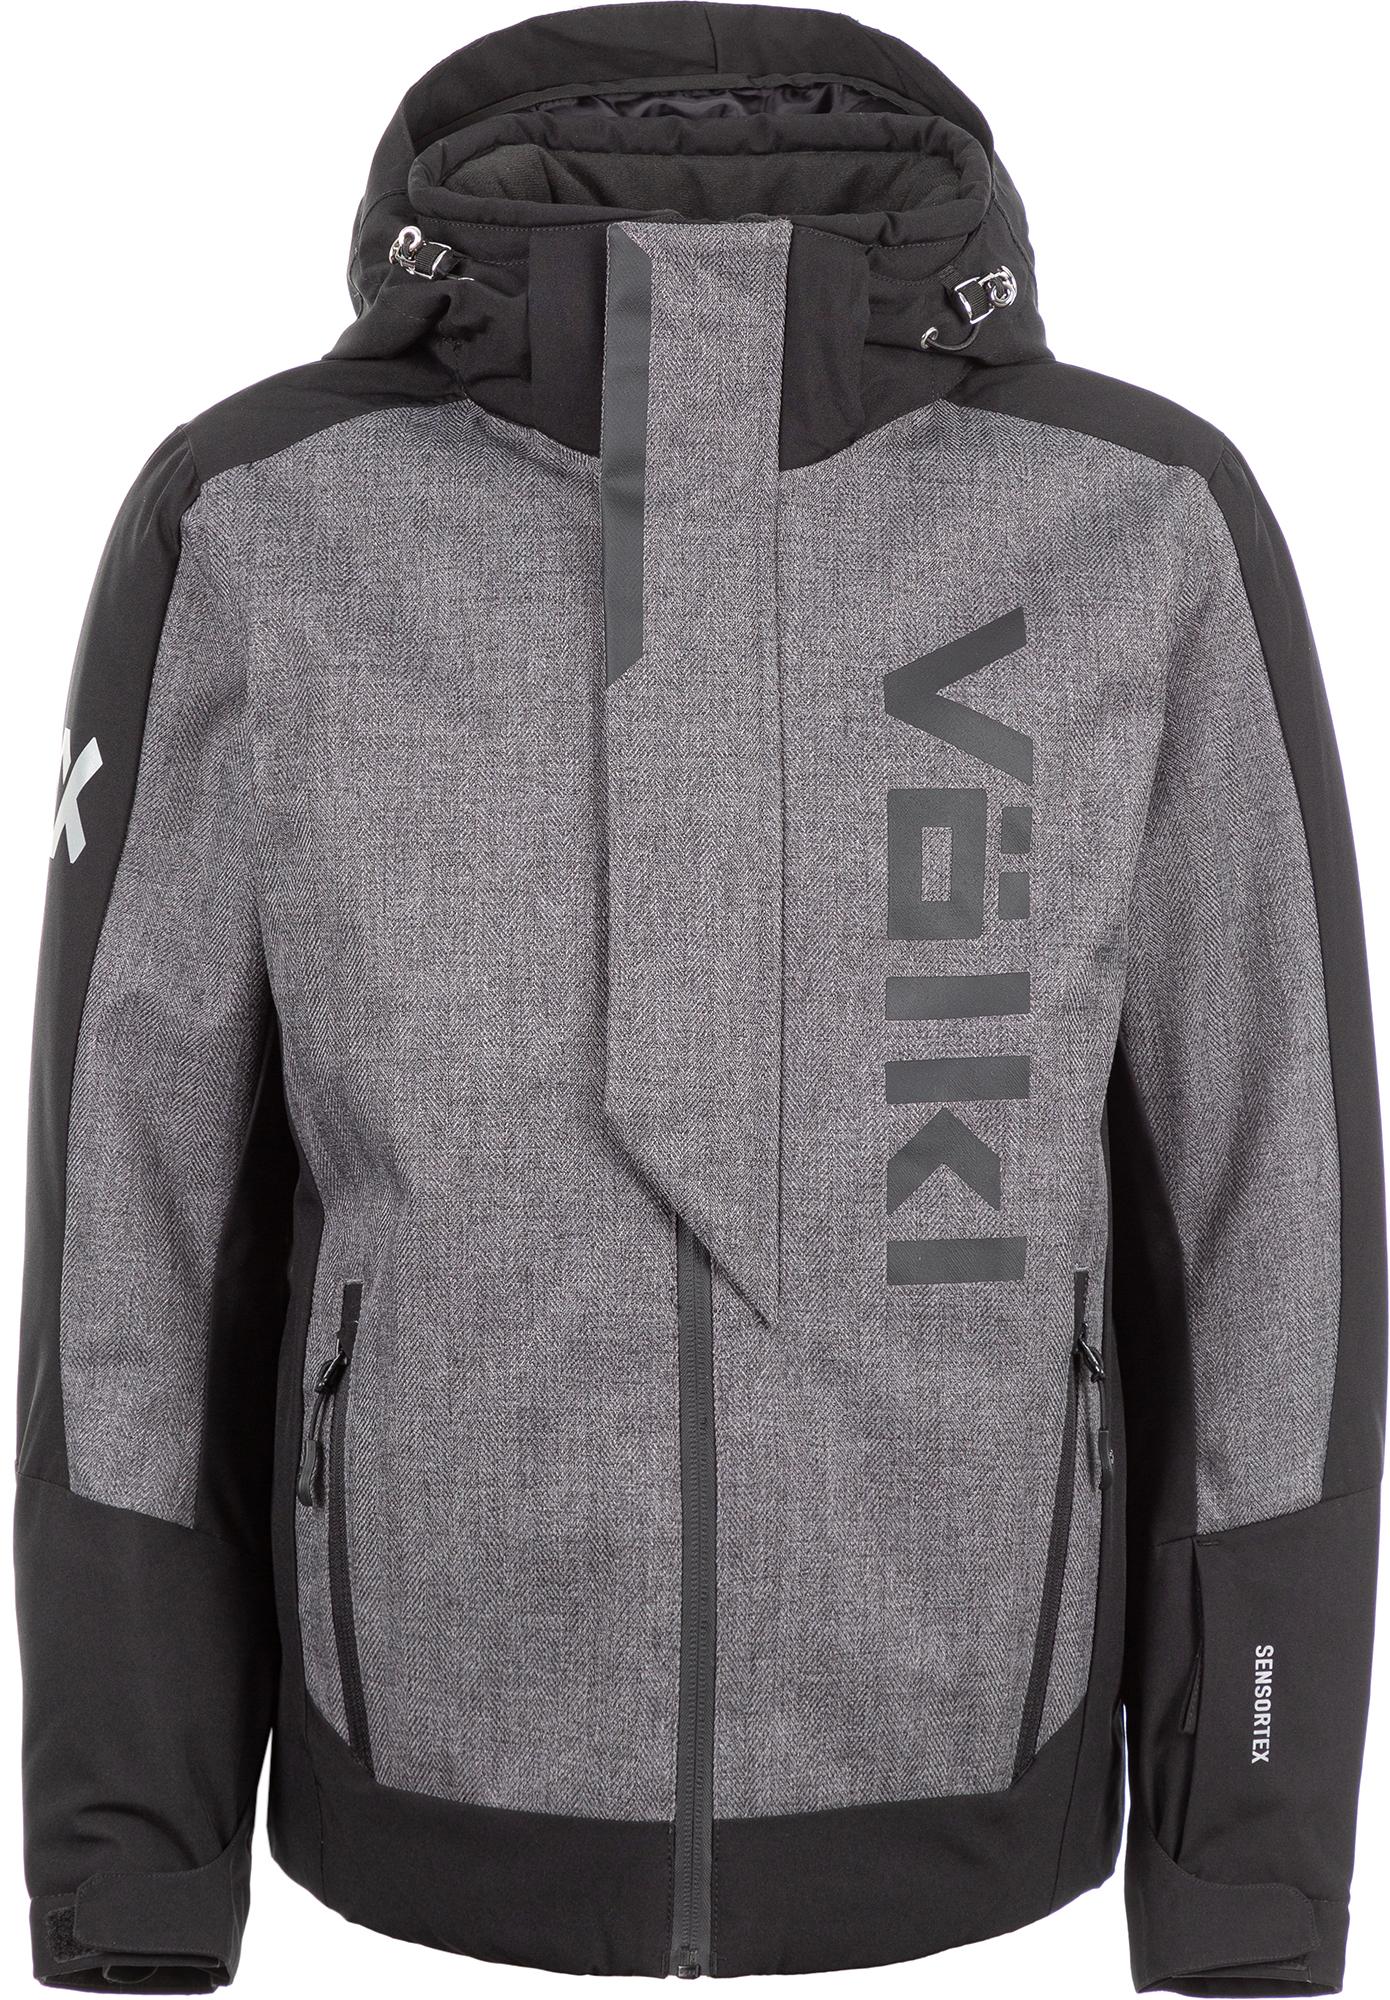 Volkl Куртка утепленная для мальчиков Volkl, размер 134 volkl volkl flair sc vmotion 11 alu gw lady 18 19 размер 158